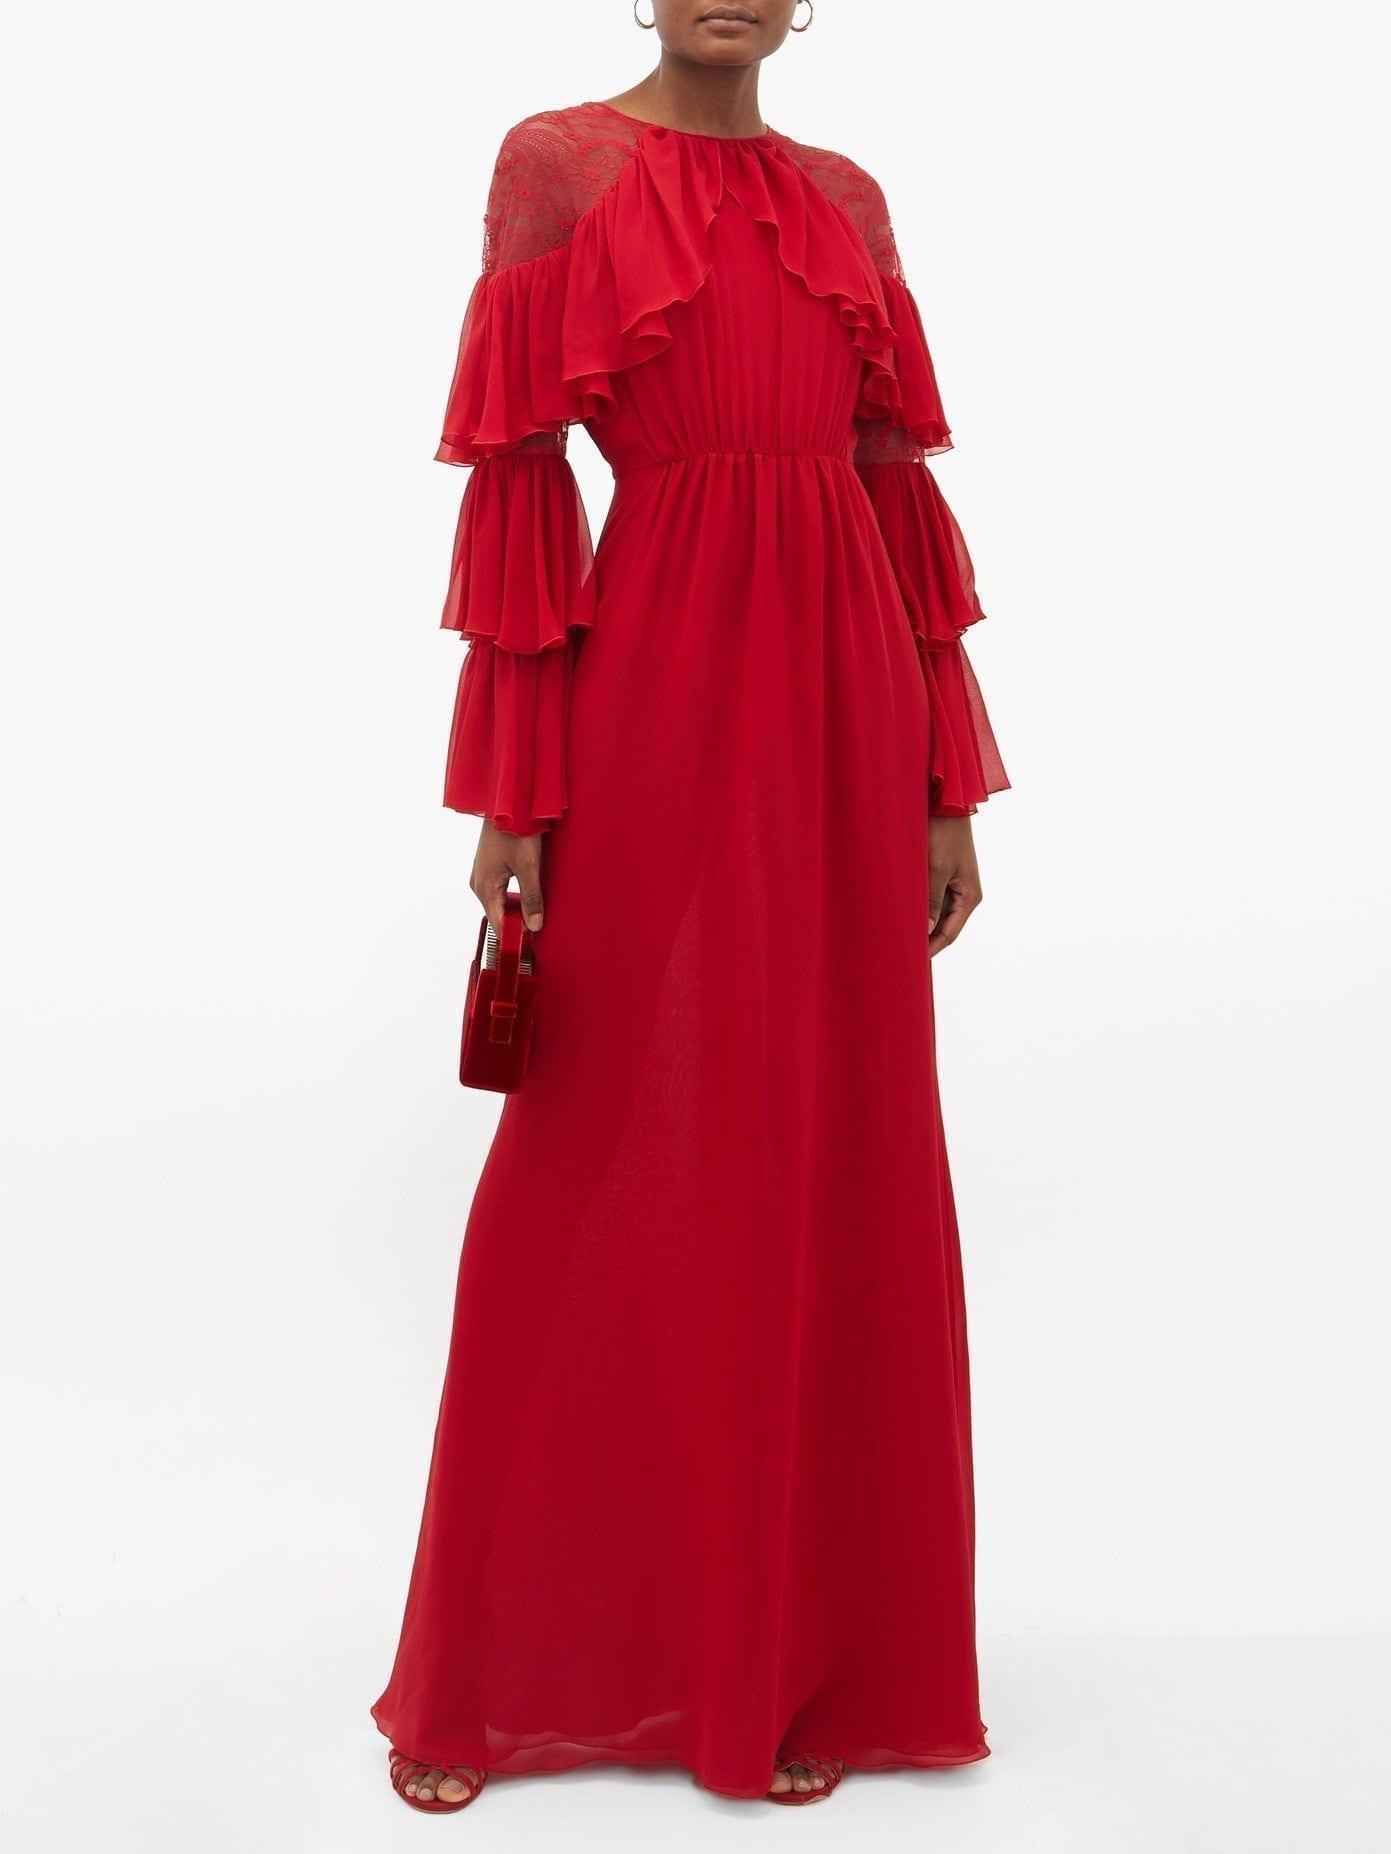 GIAMBATTISTA VALLI Ruffled Lace-trimmed Silk-georgette Gown